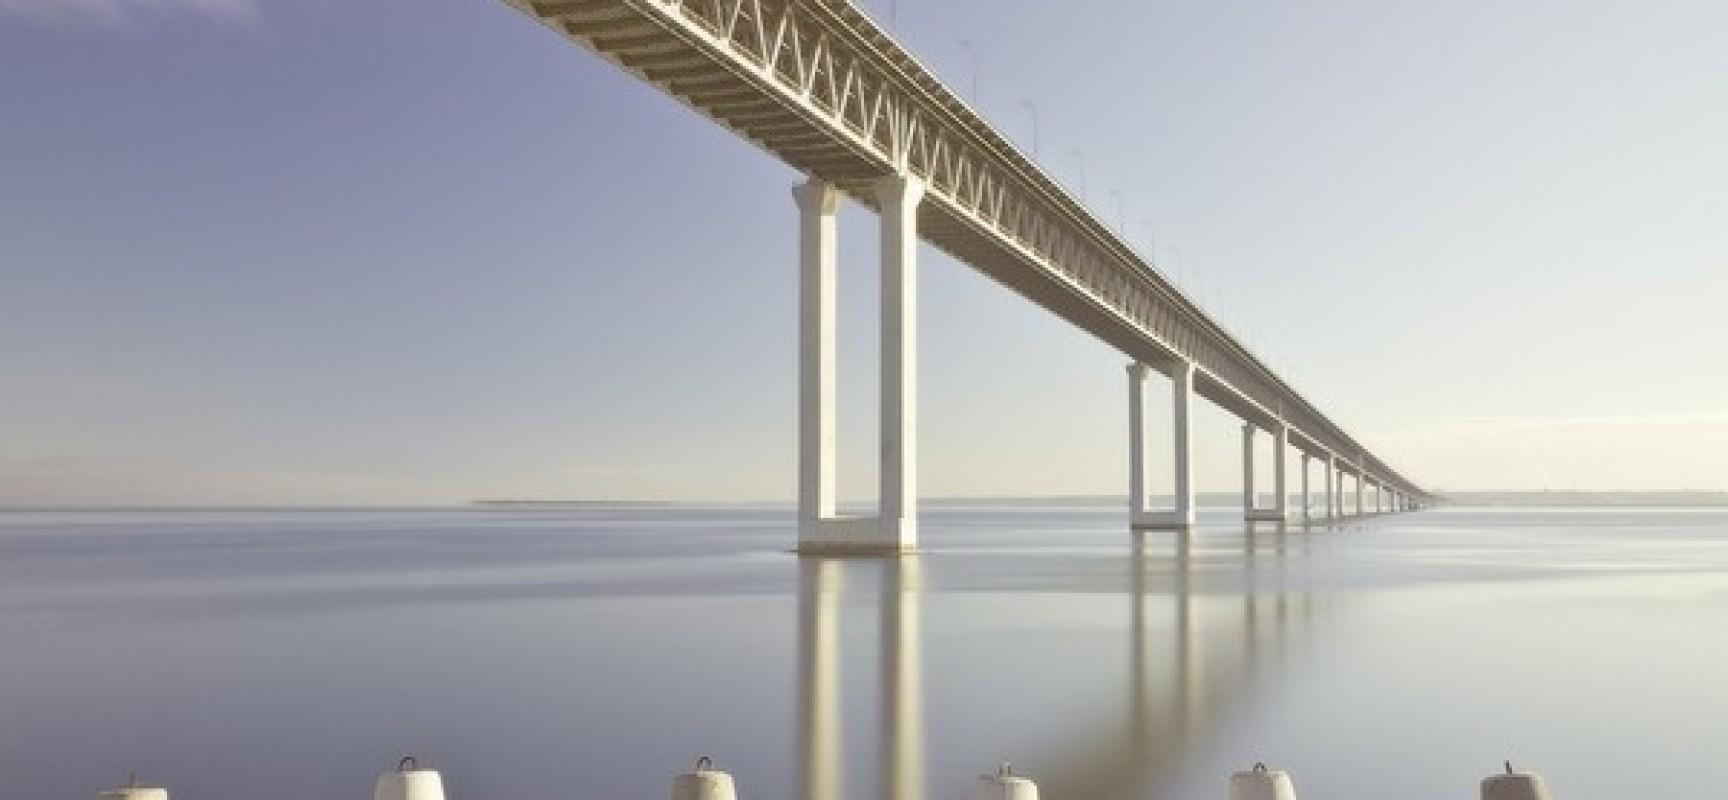 Росавтодор заключил с компанией «Стройгазмонтаж» контракт на строительство моста через Керченский пролив